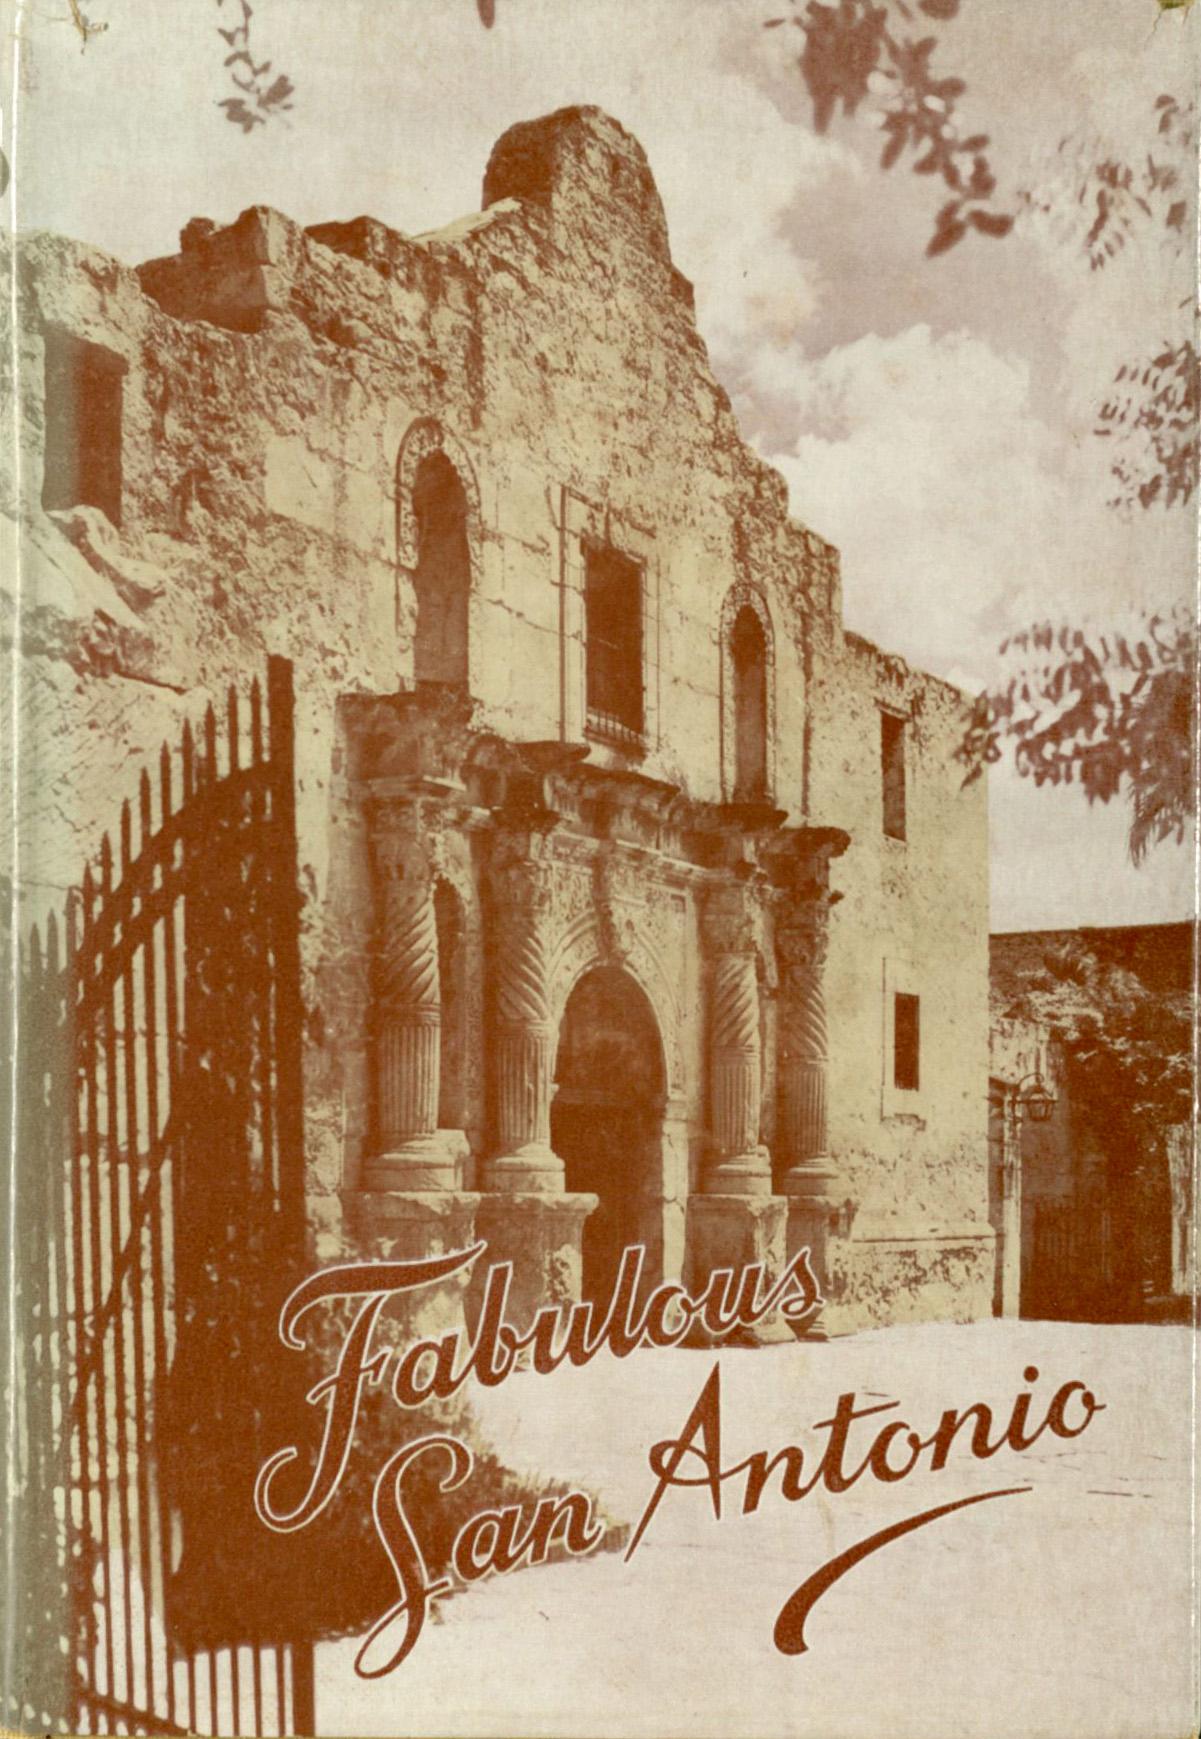 Curtis, Albert. Fabulous San Antonio. San Antonio, Naylor Co. [1955]. Print.